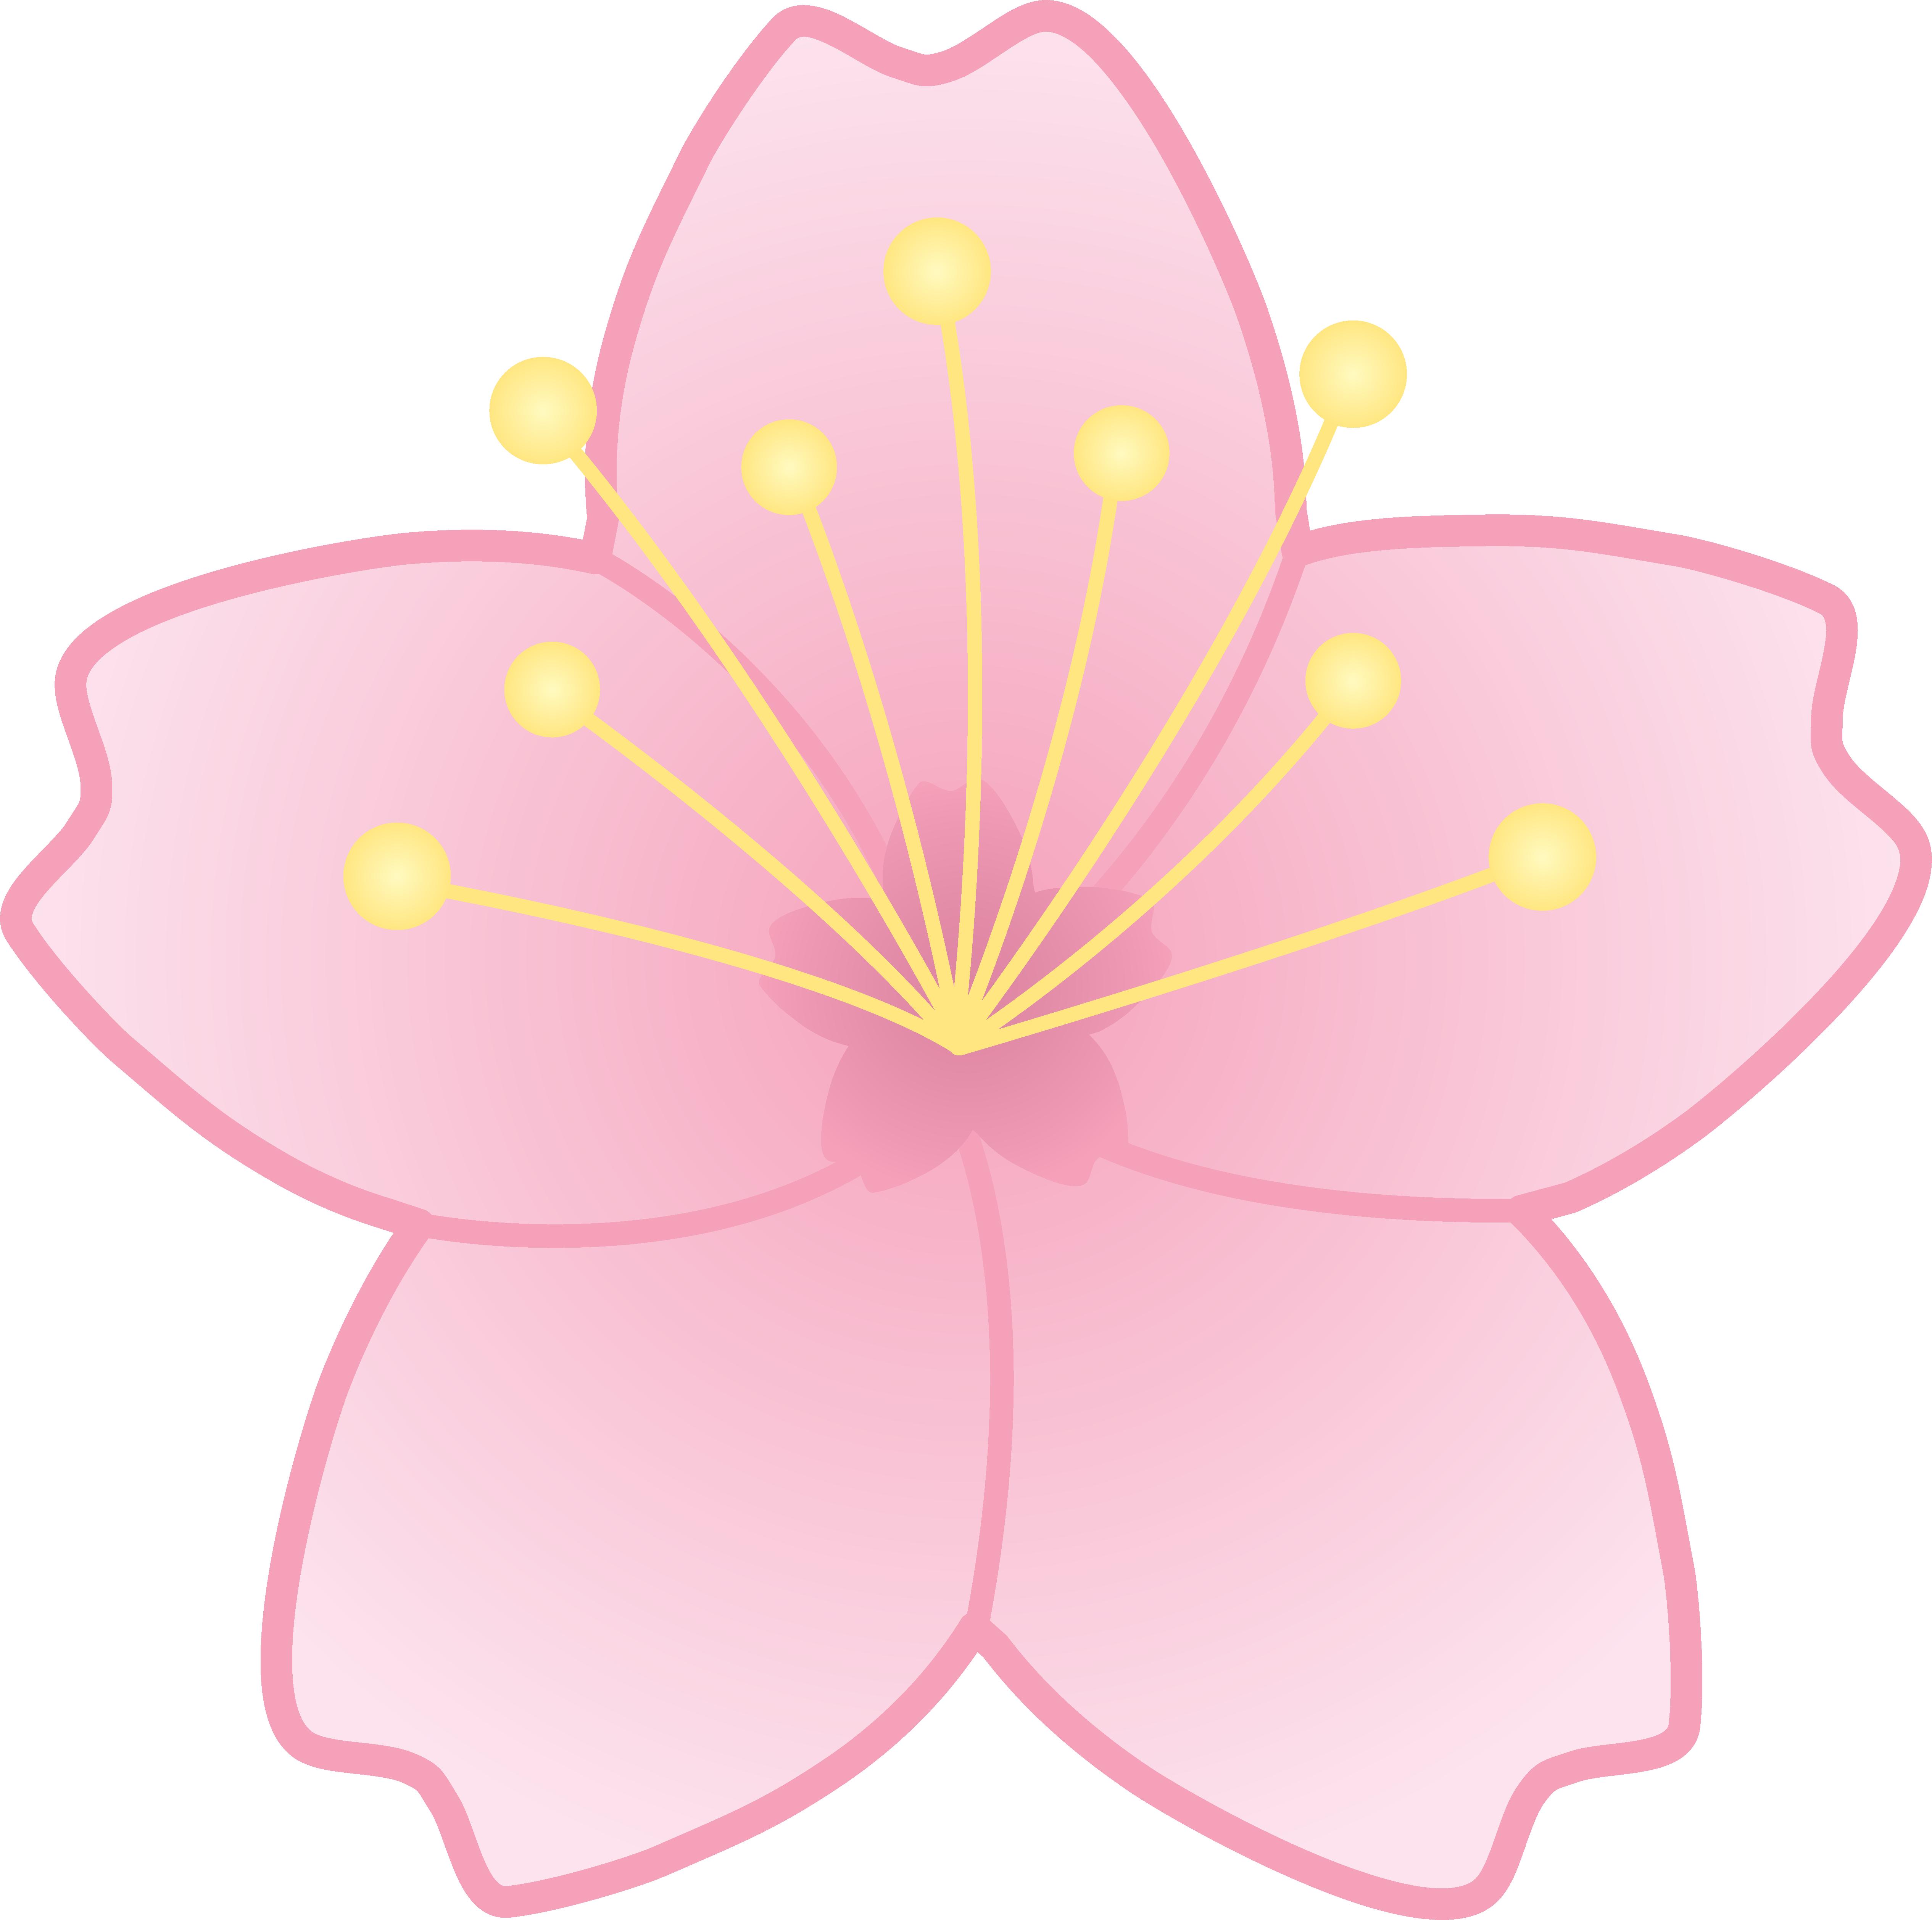 Sakura Blossom clipart #2, Download drawings